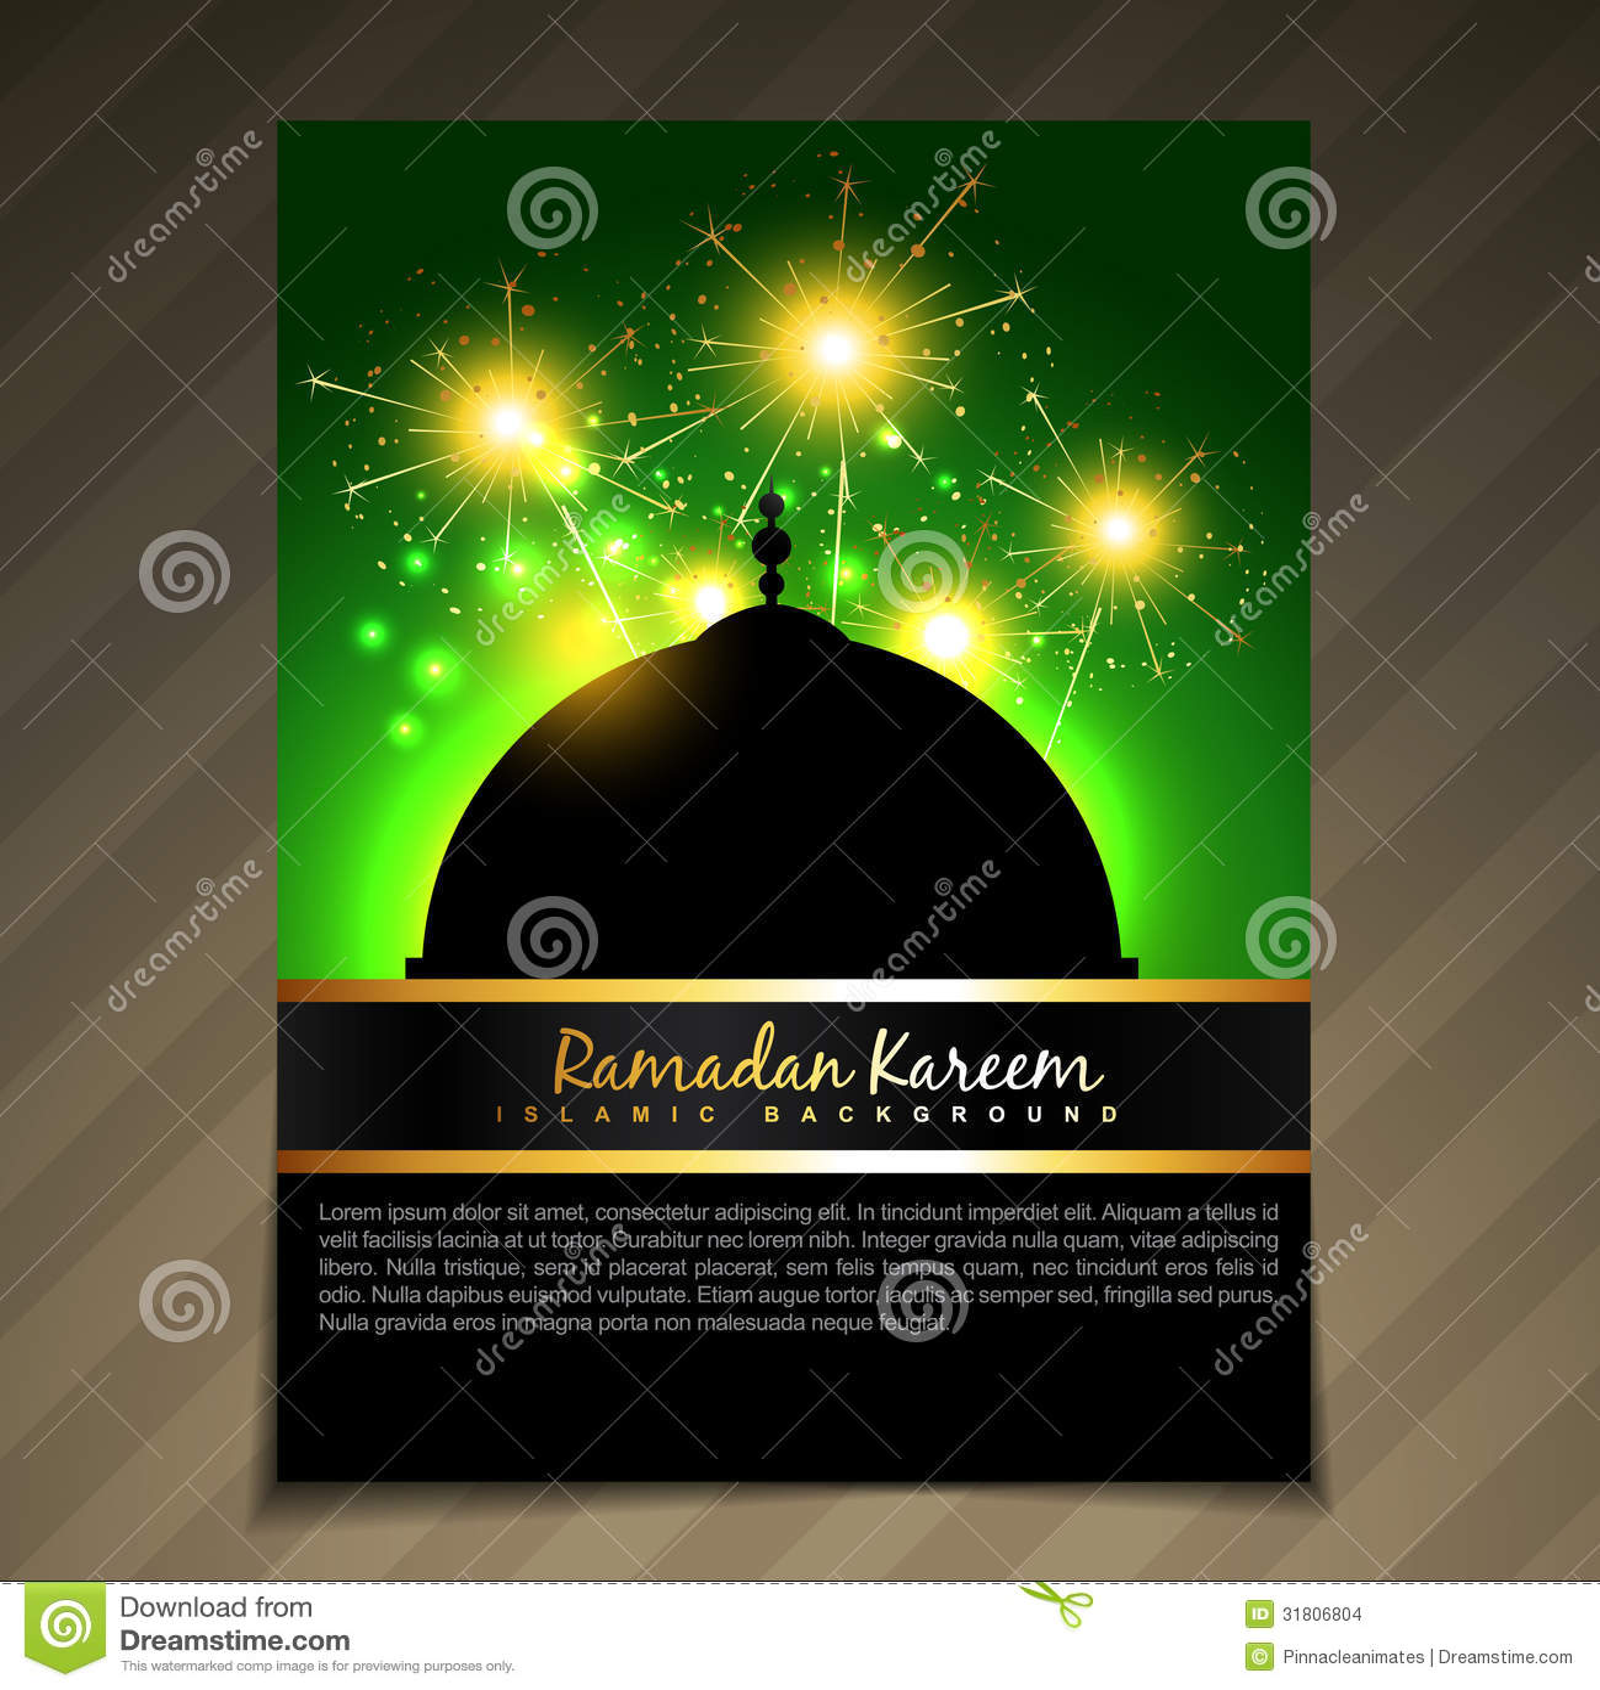 muslim will template - islamic brochure deesign stock images image 31806804